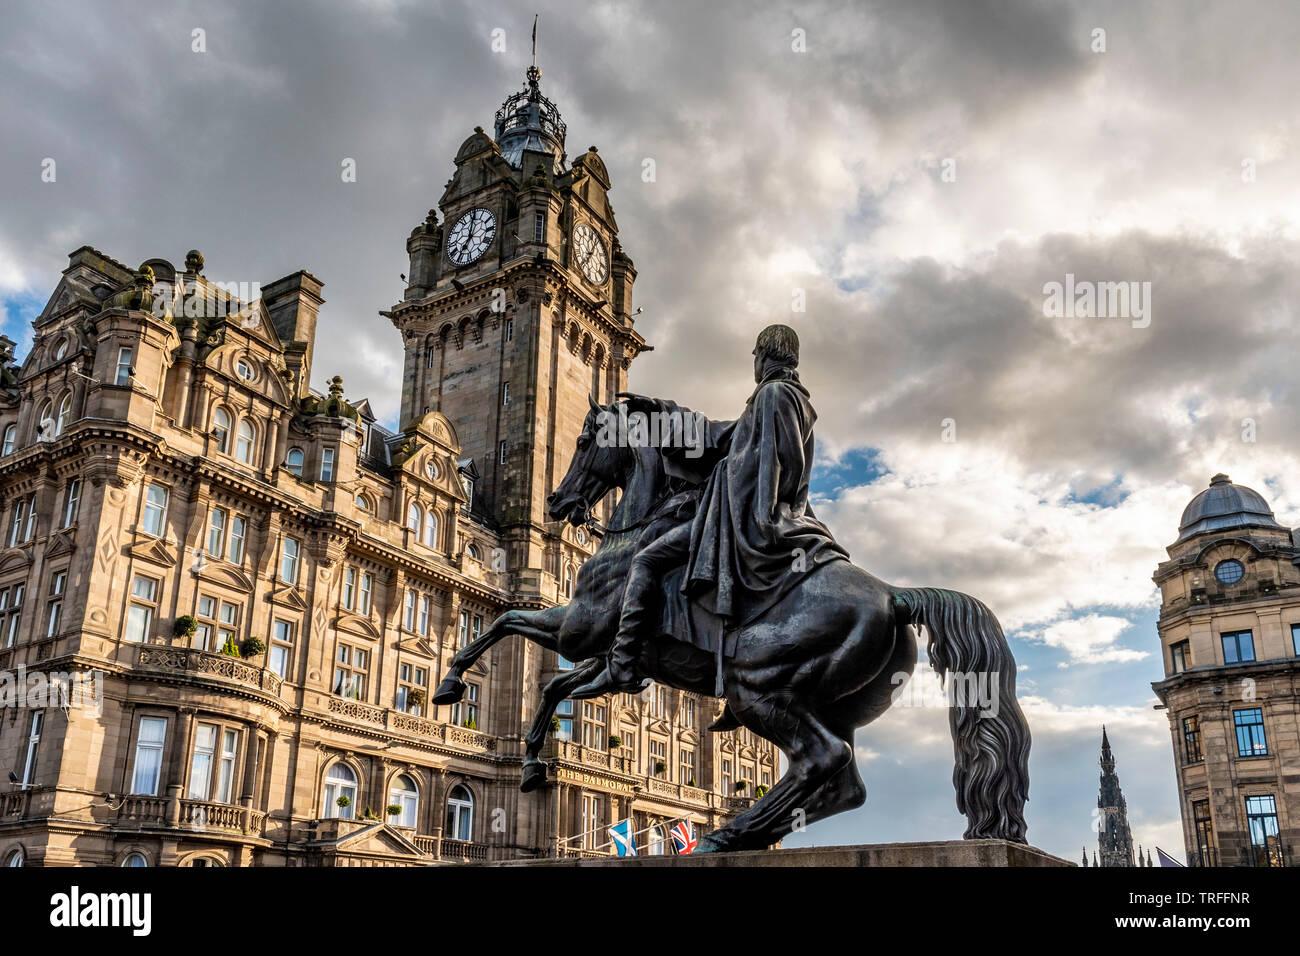 The Iron Duke, Waterloo Place, Edinburgh - Stock Image